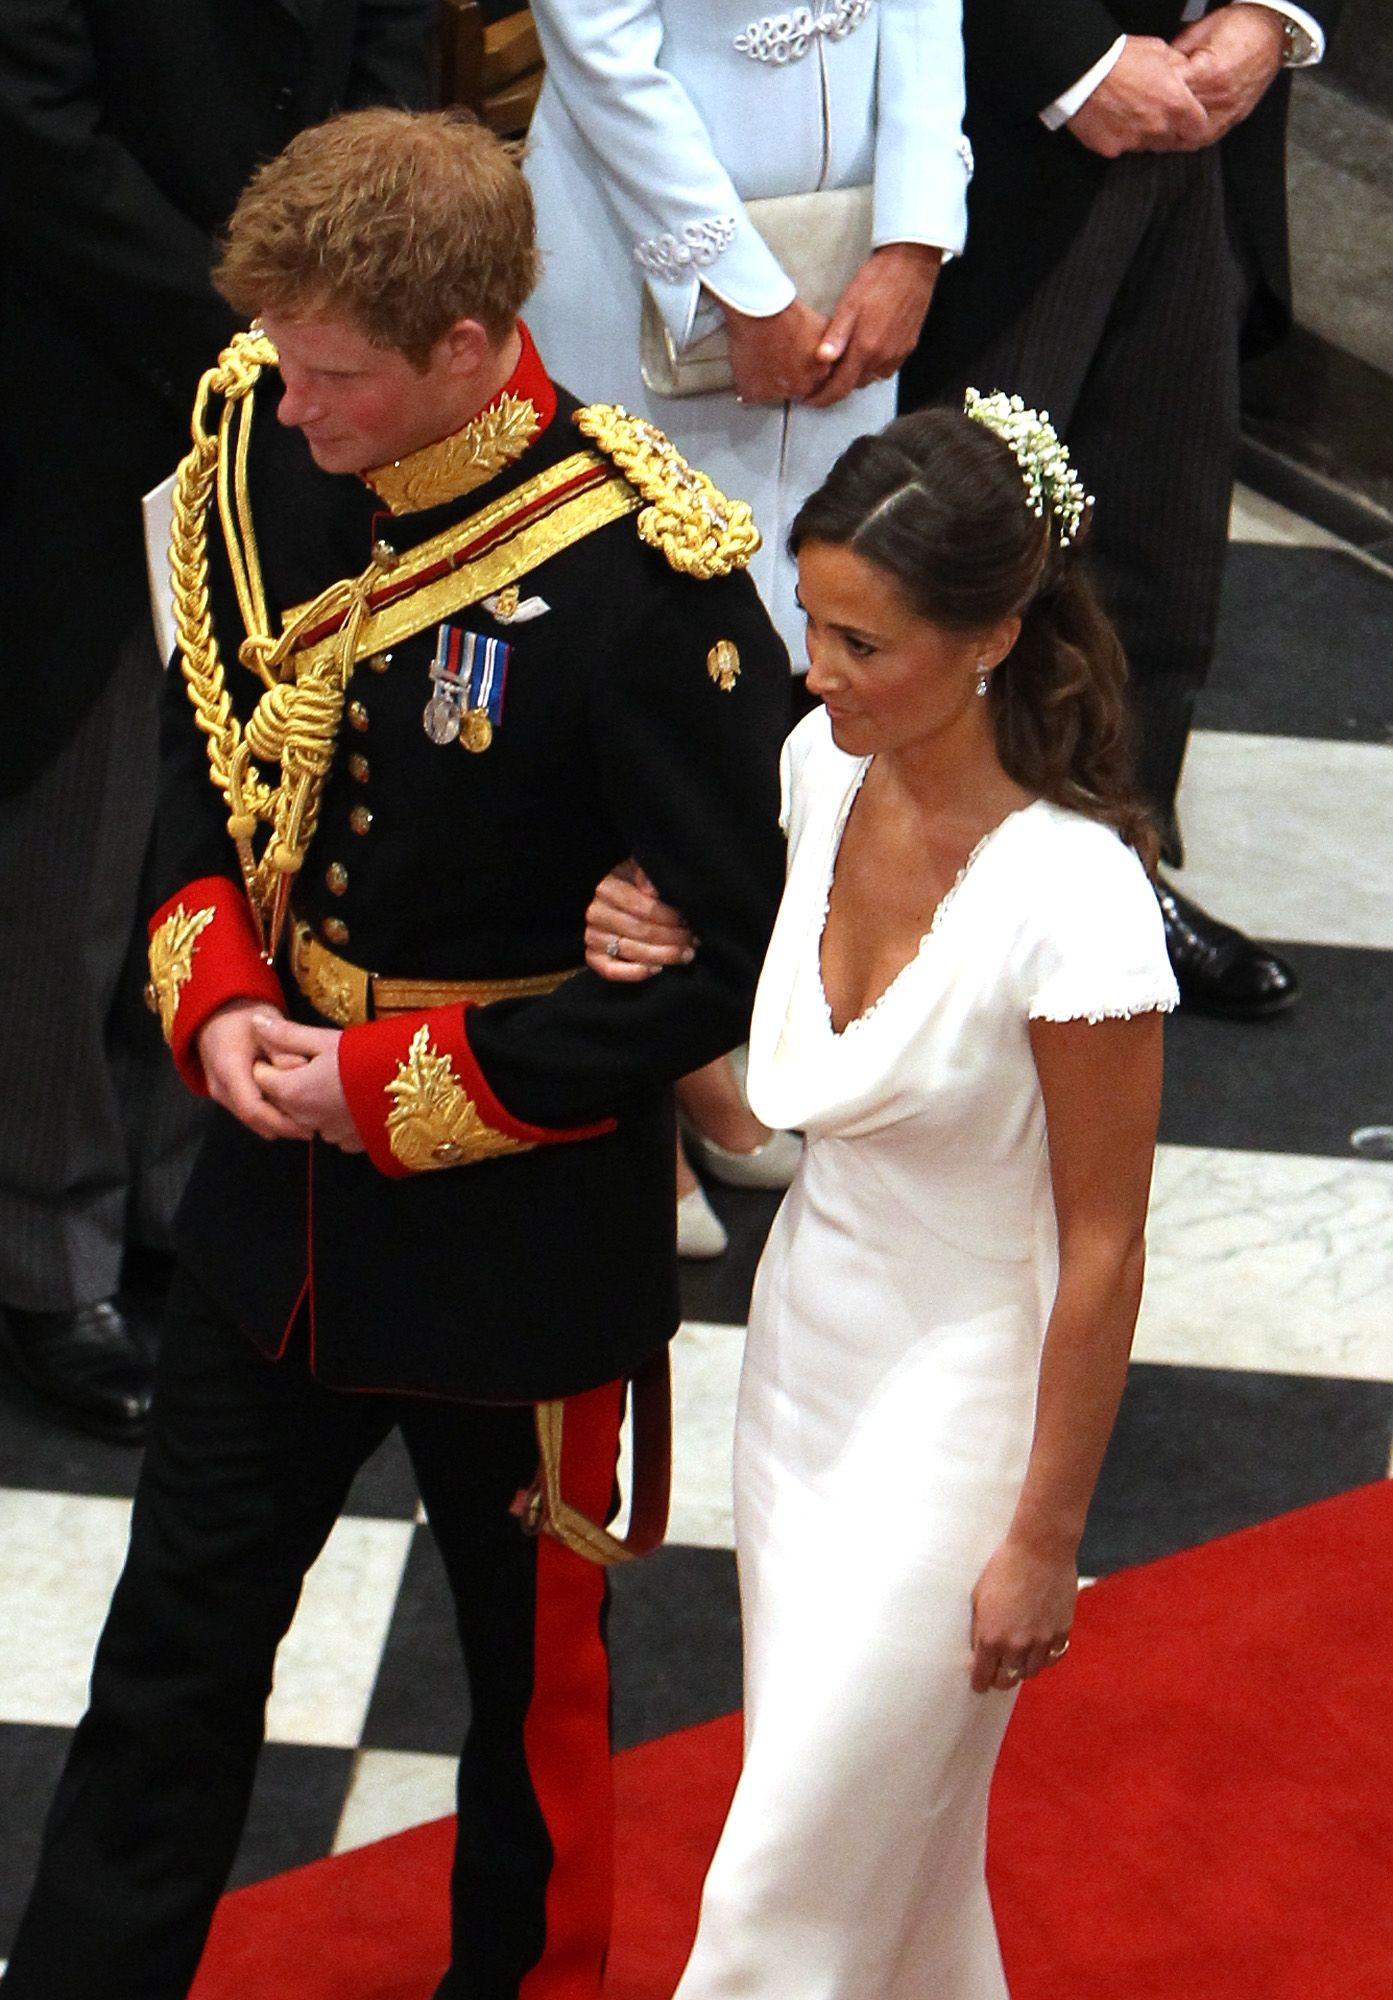 Harry And Pippa Pippa Middleton Pippa Middleton Photos Royal Wedding 2011